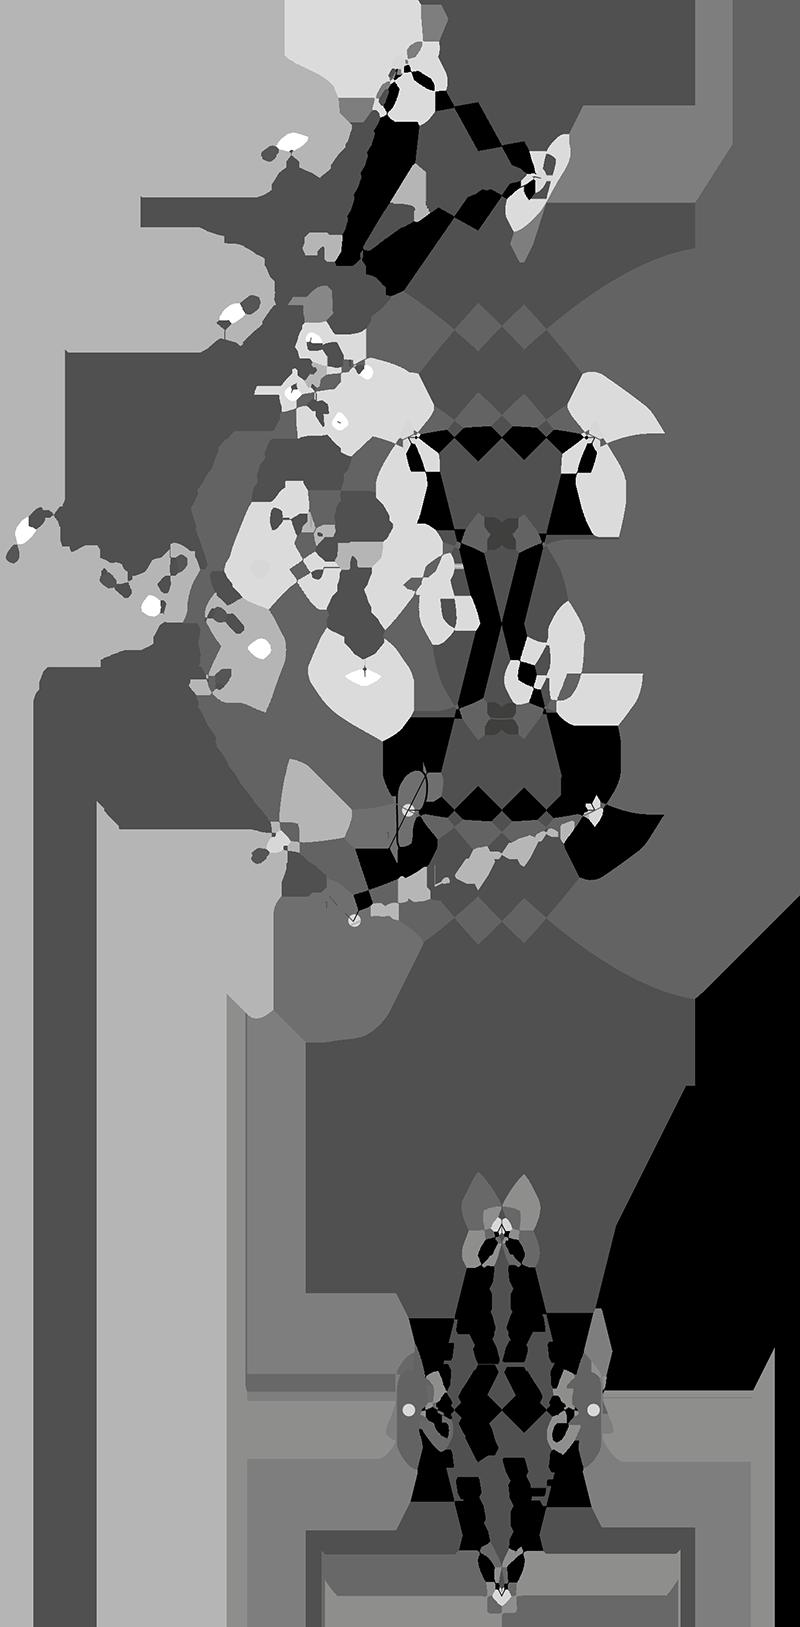 5-etapes-du-combat-schema-wing-chun-traditionnel-ecole-kung-fu-toulouse-sifu-stephane-serror